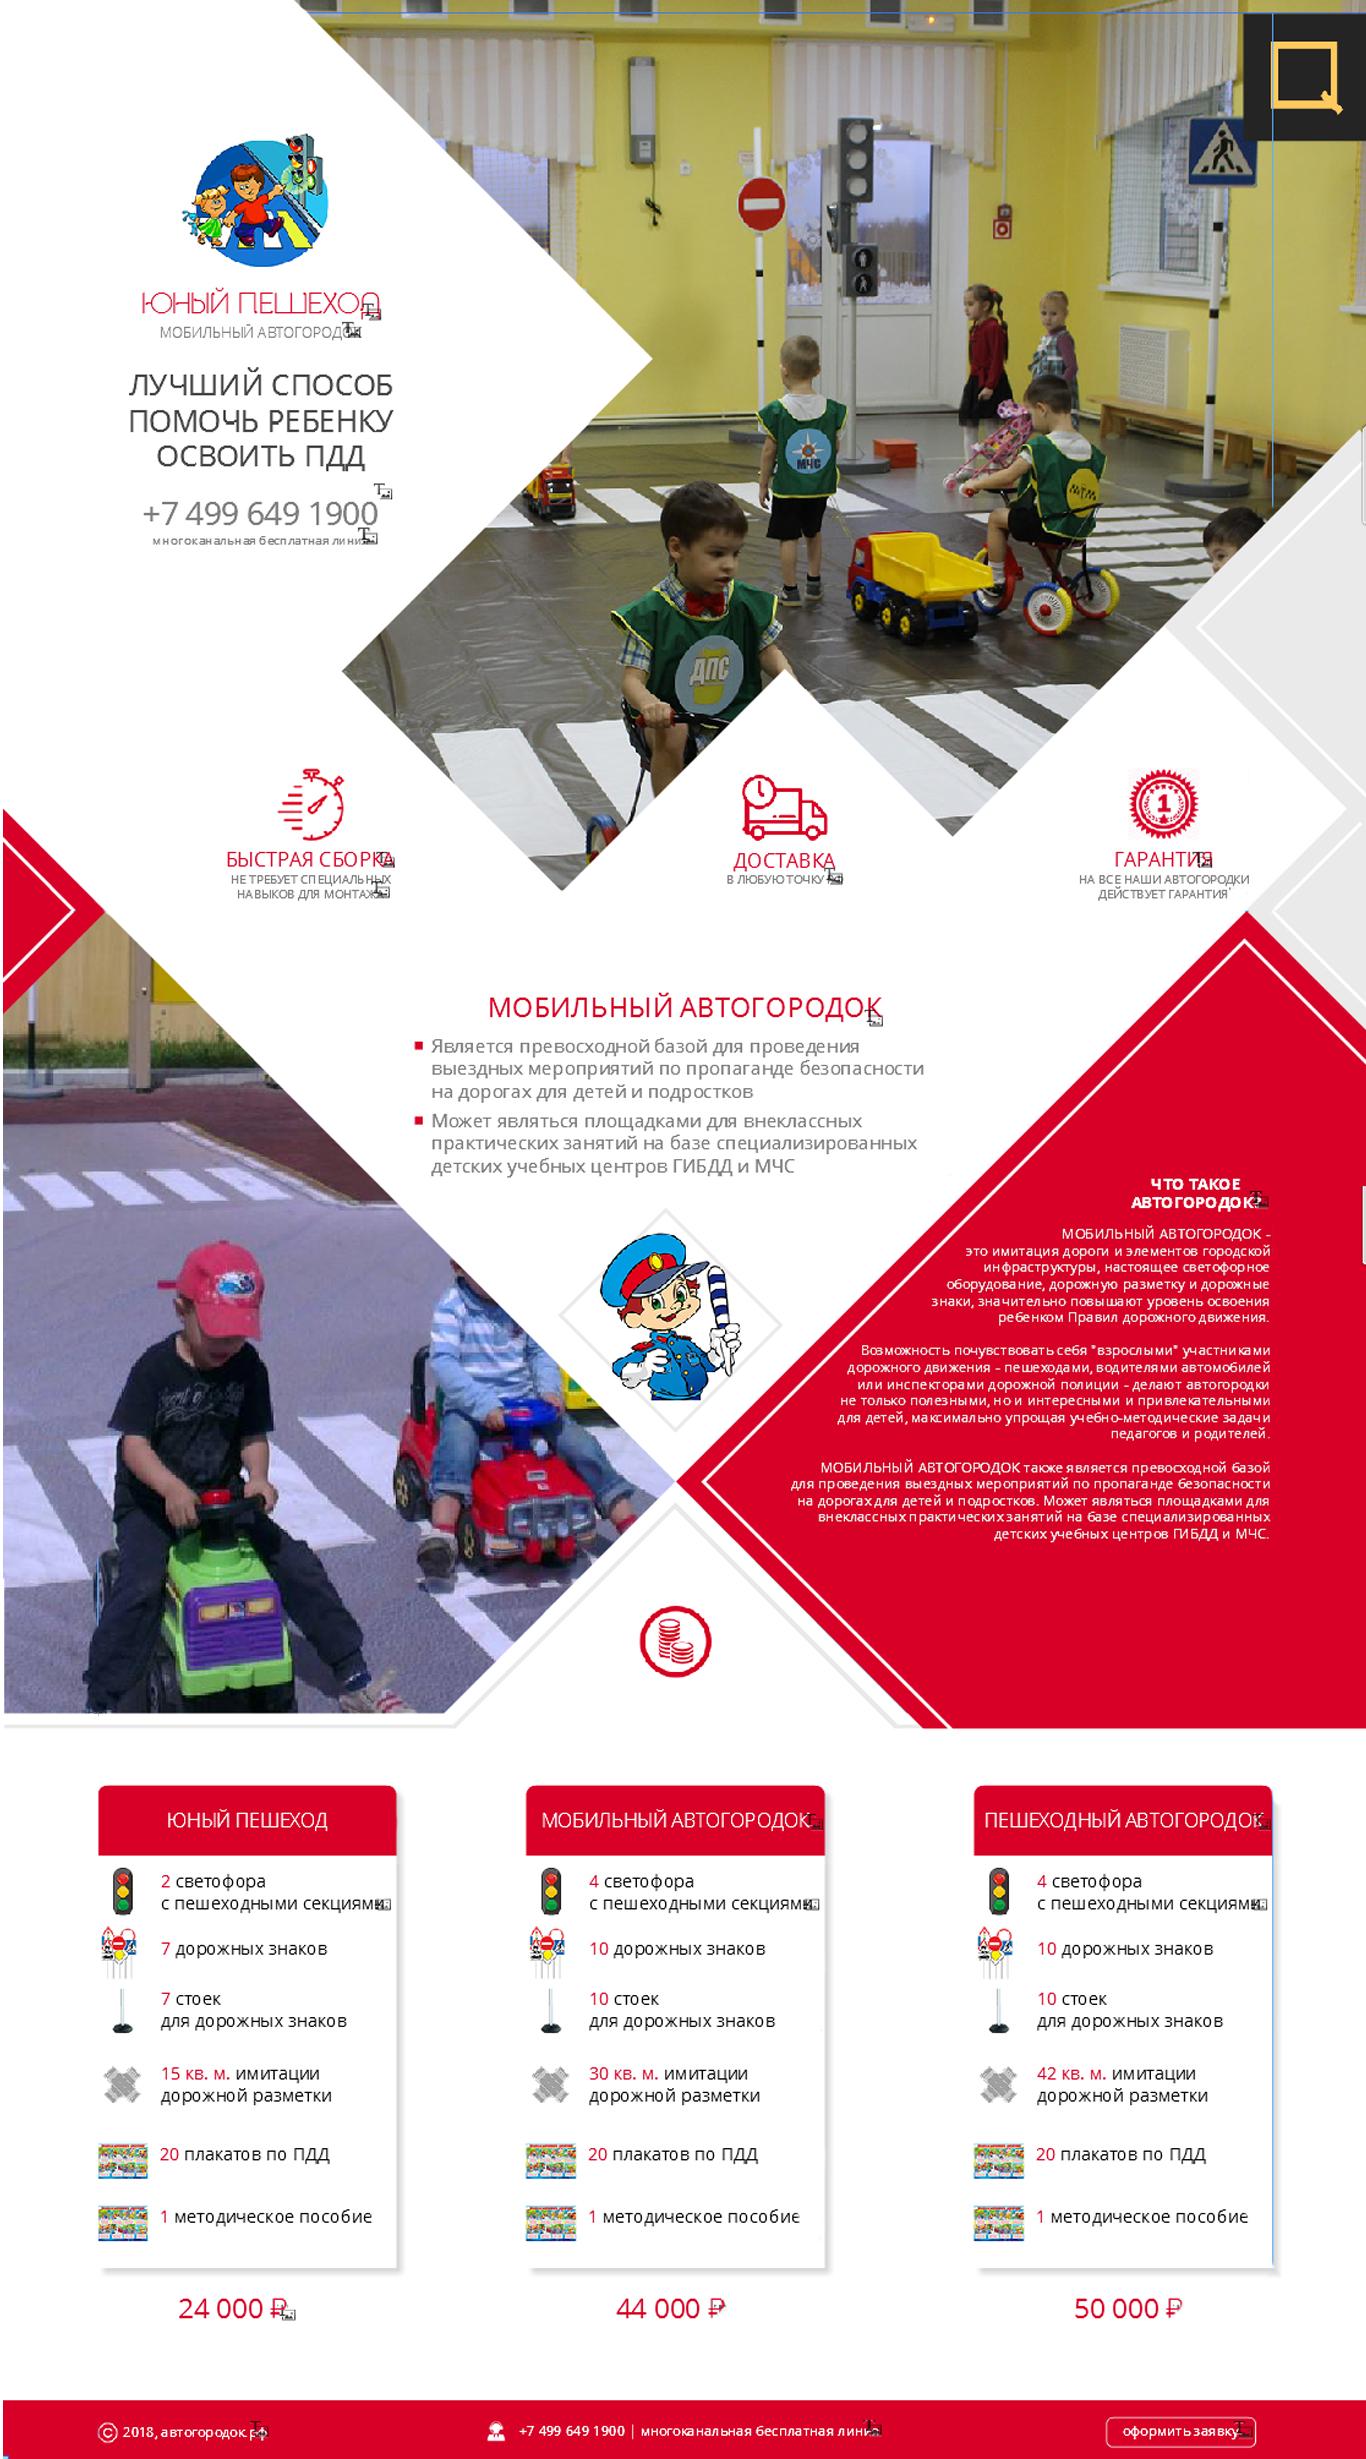 Редизайн сайтов (выбираем исполнителя постоянной основе) фото f_3365a776a94e84ed.jpg